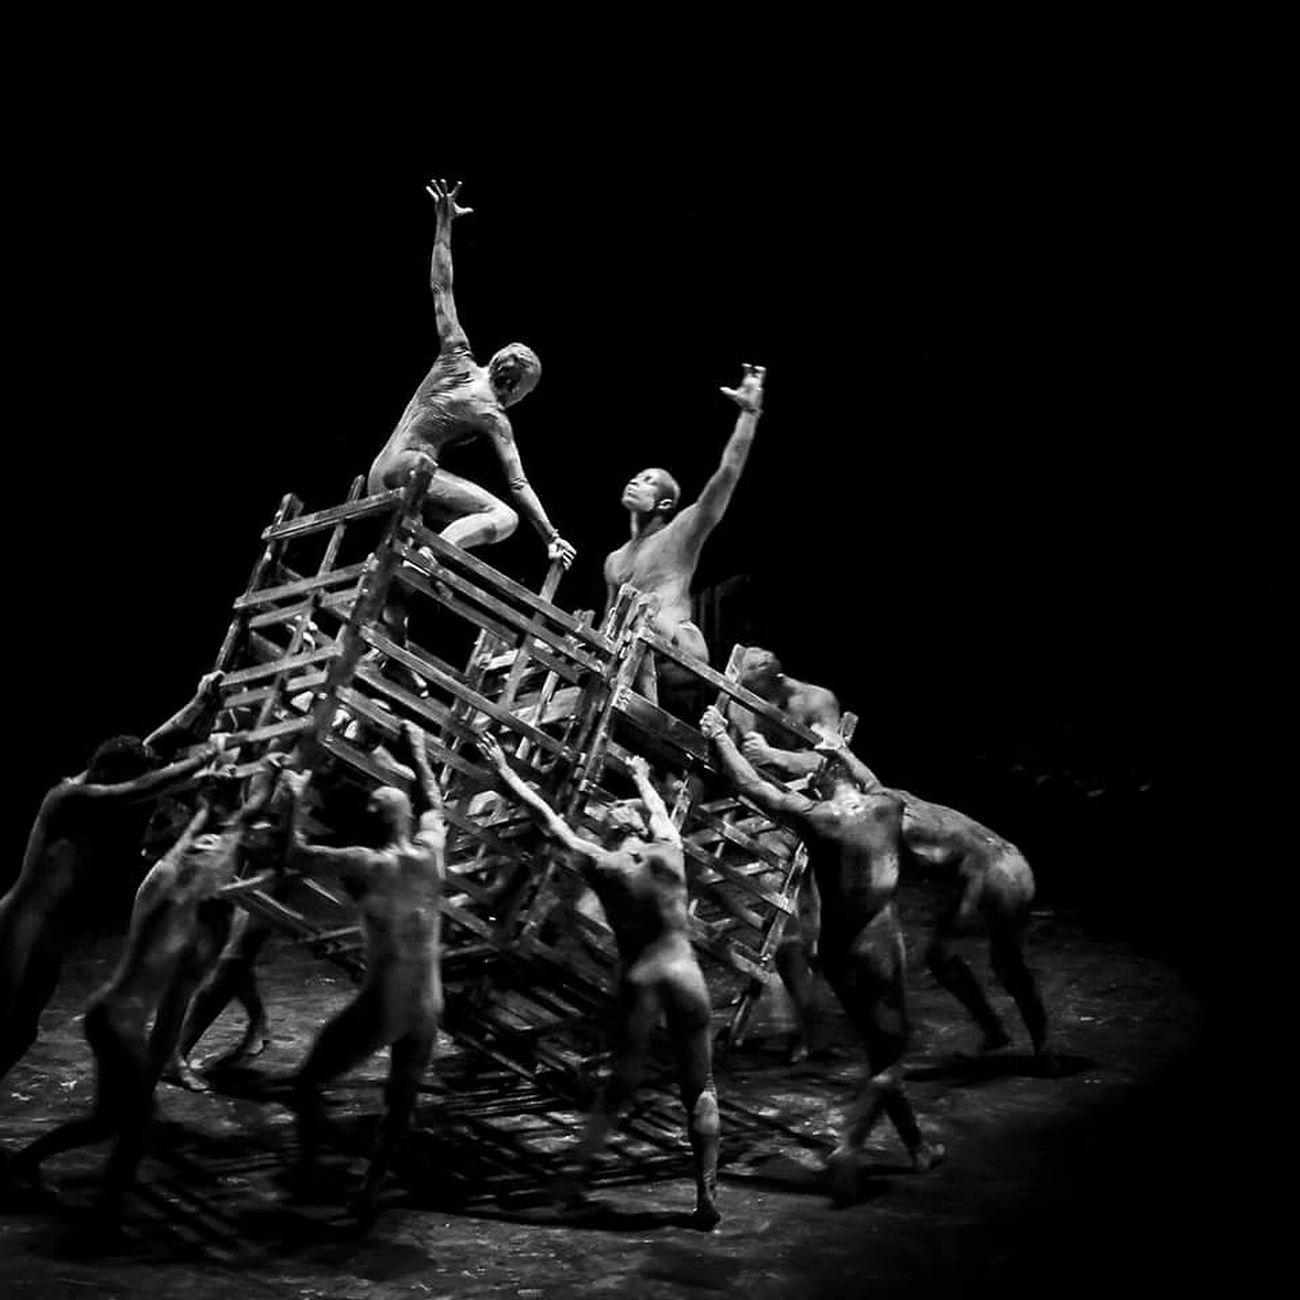 Black Background Arts Culture And Entertainment People Bnw Photography Deboracolker Deborah Dancers DANCE ♥ Espetaculo